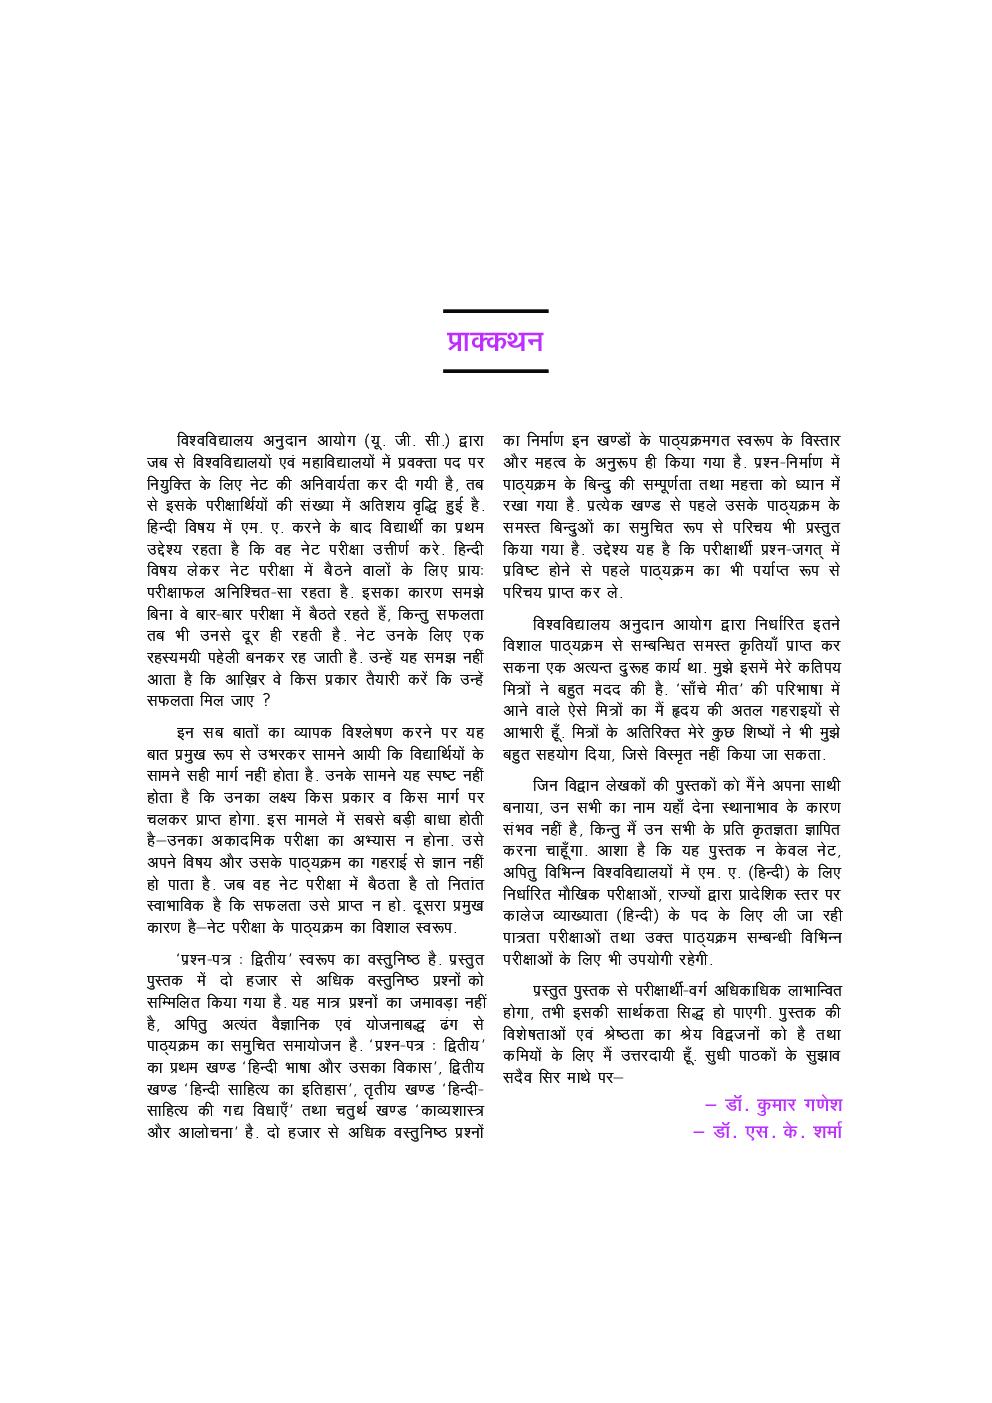 UGC NET/JRF/SET हिंदी Paper-II - Page 4